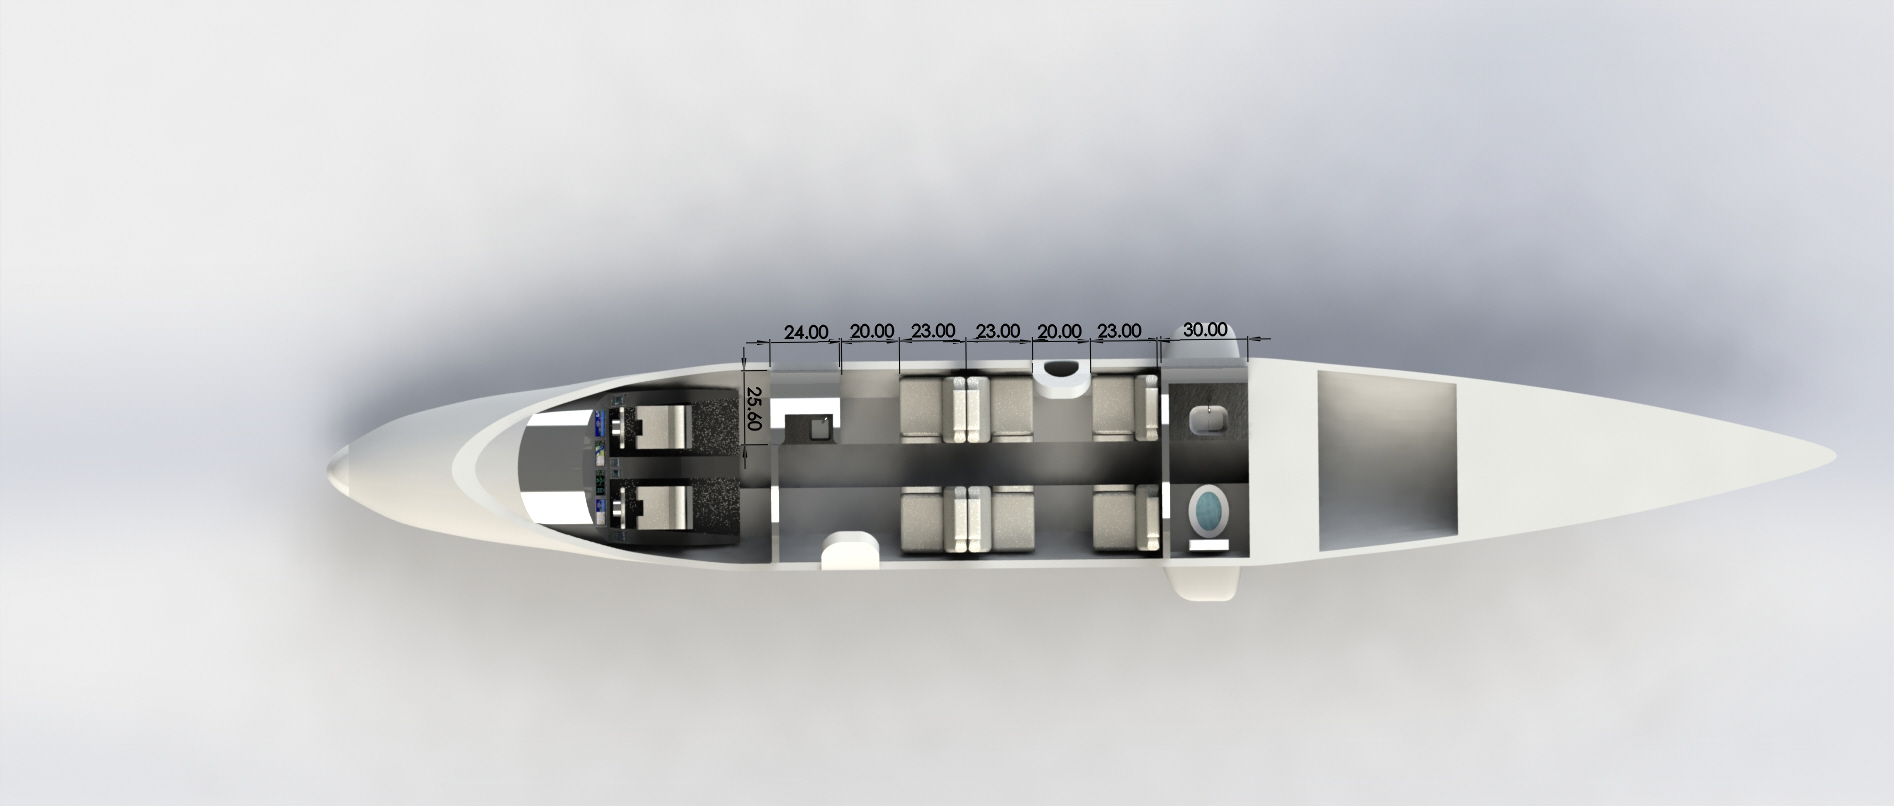 6 Passenger Top View Interior